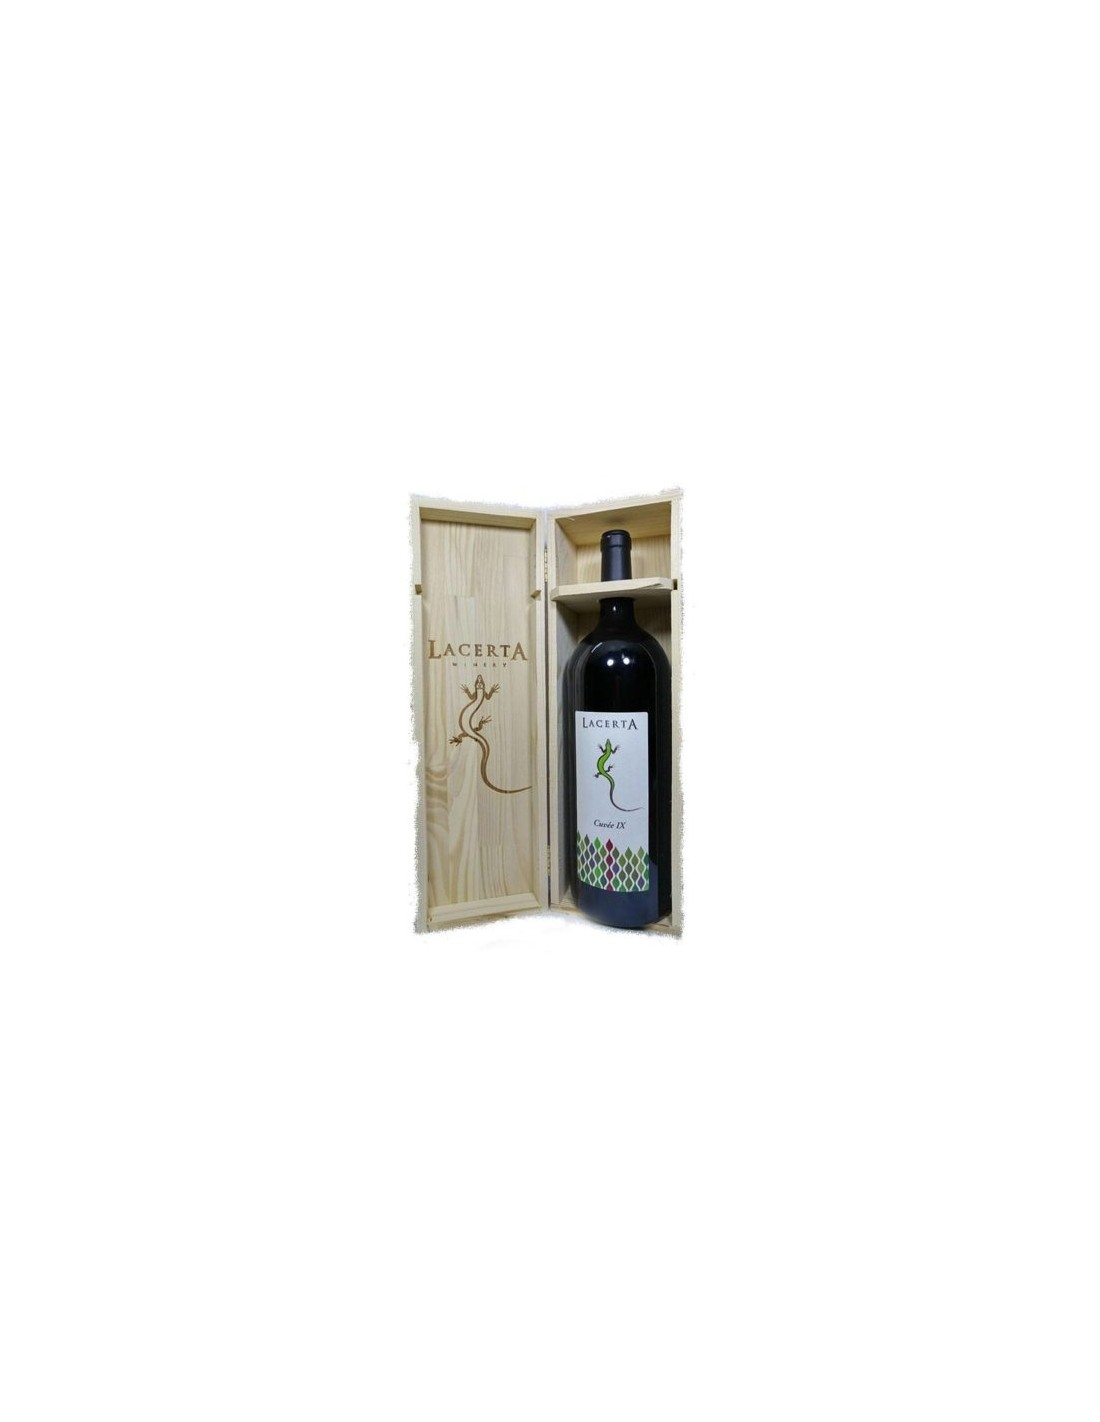 Vin rosu, Cupaj, Lacerta Cuvee IX Magnum Dealu Mare, 2014, 0.75L, Romania